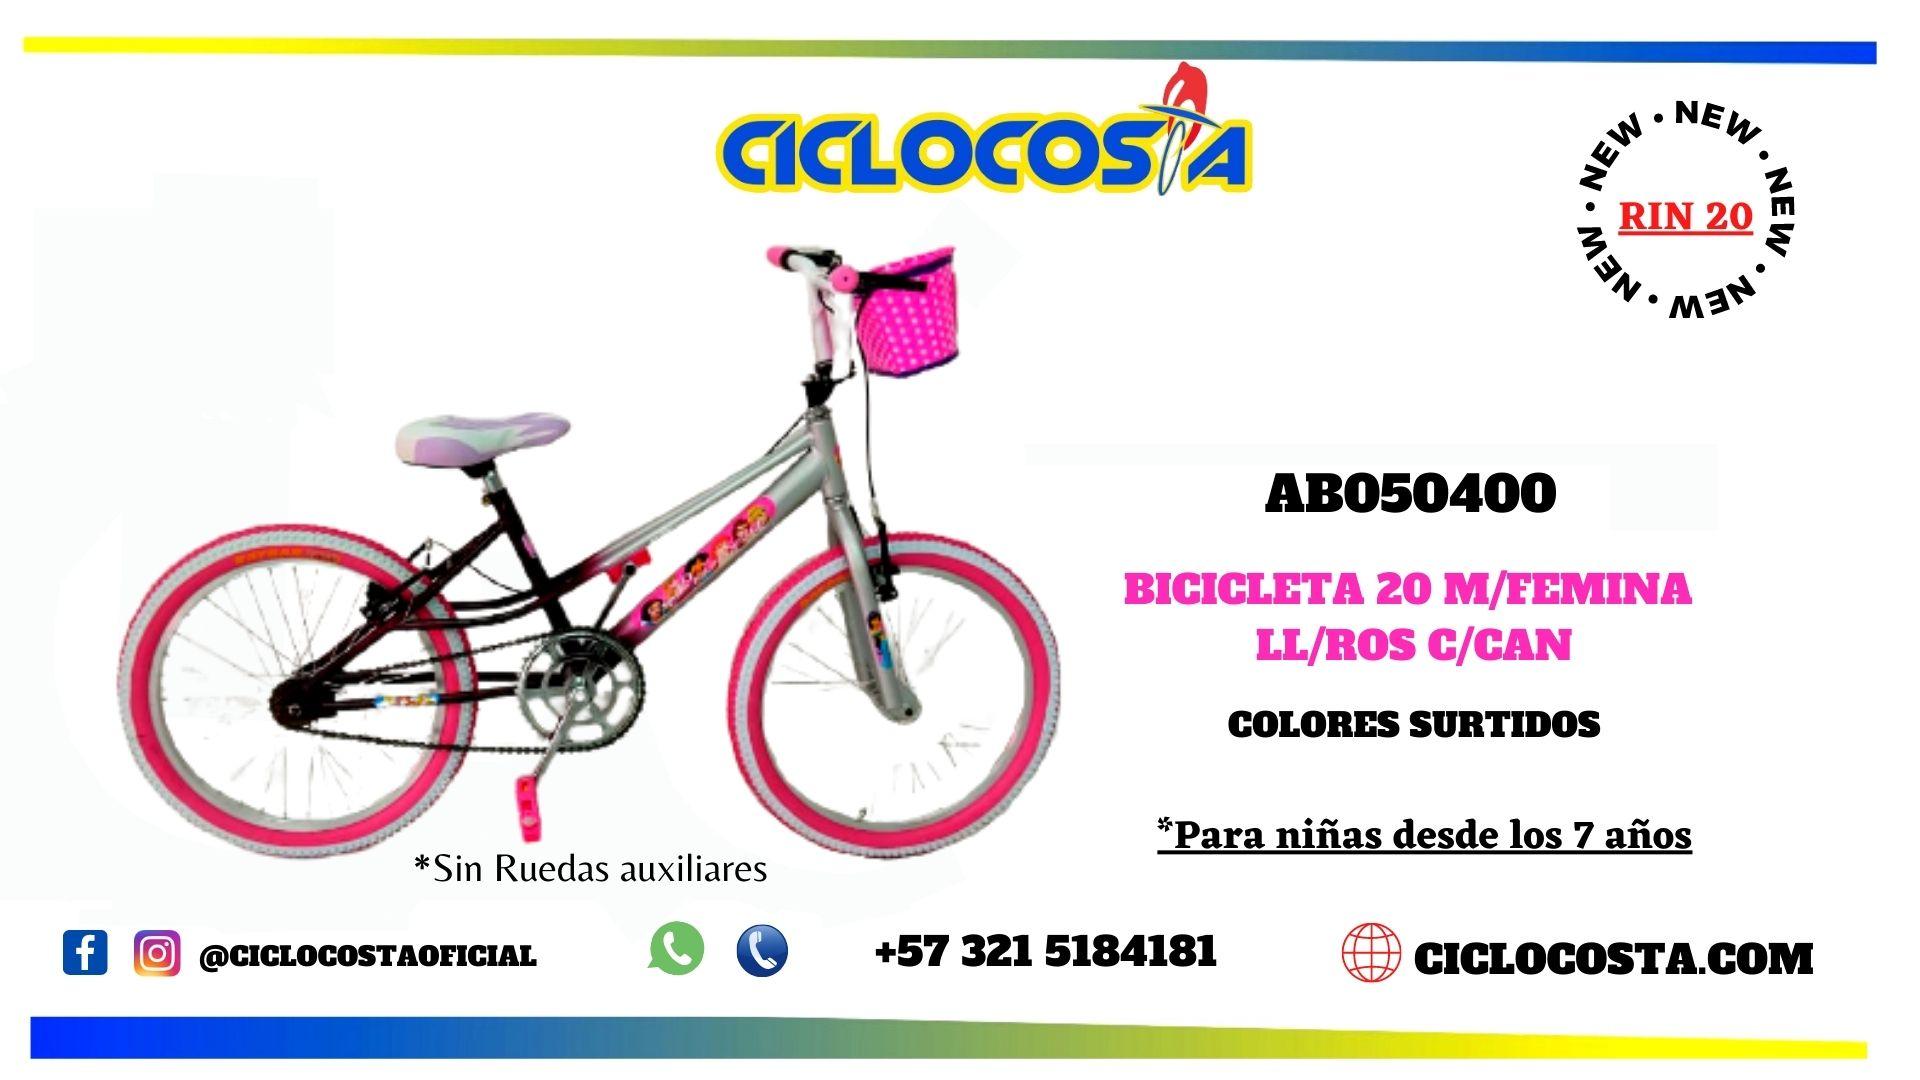 AB050400